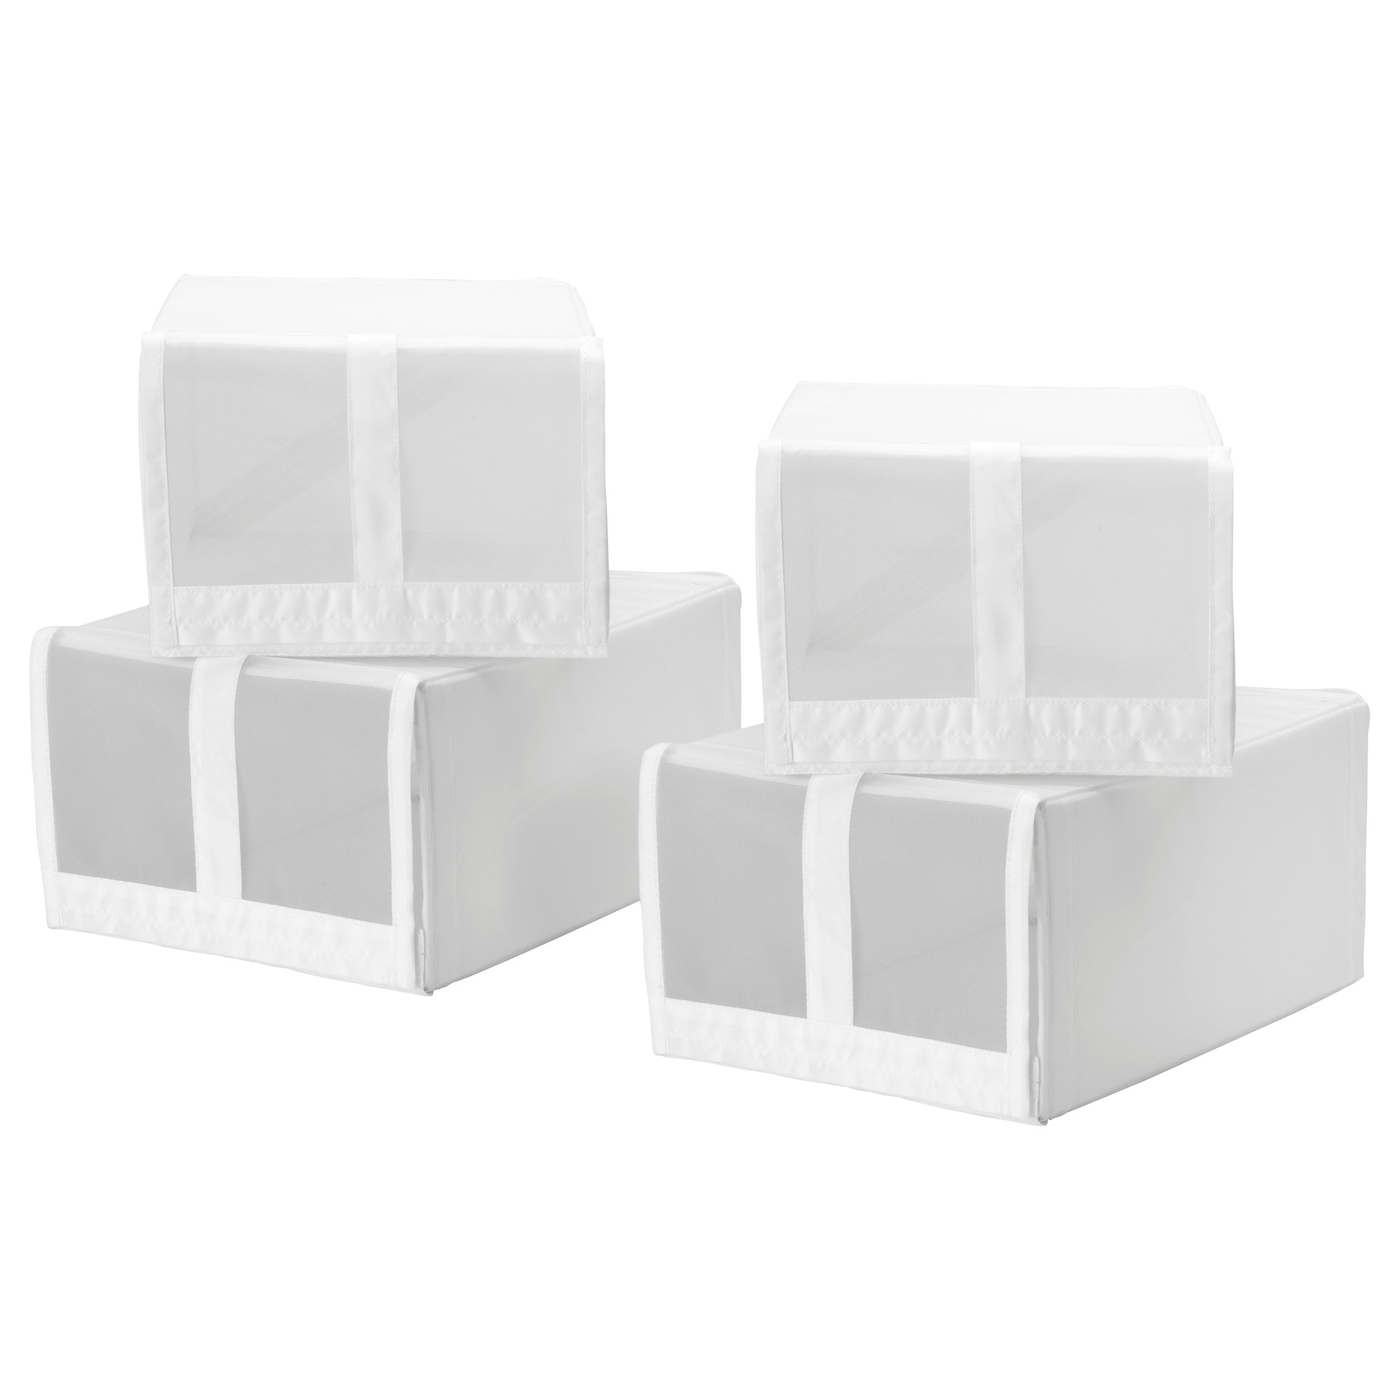 skubb boîte à chaussures blanc 22 x 34 x 16 cm - ikea